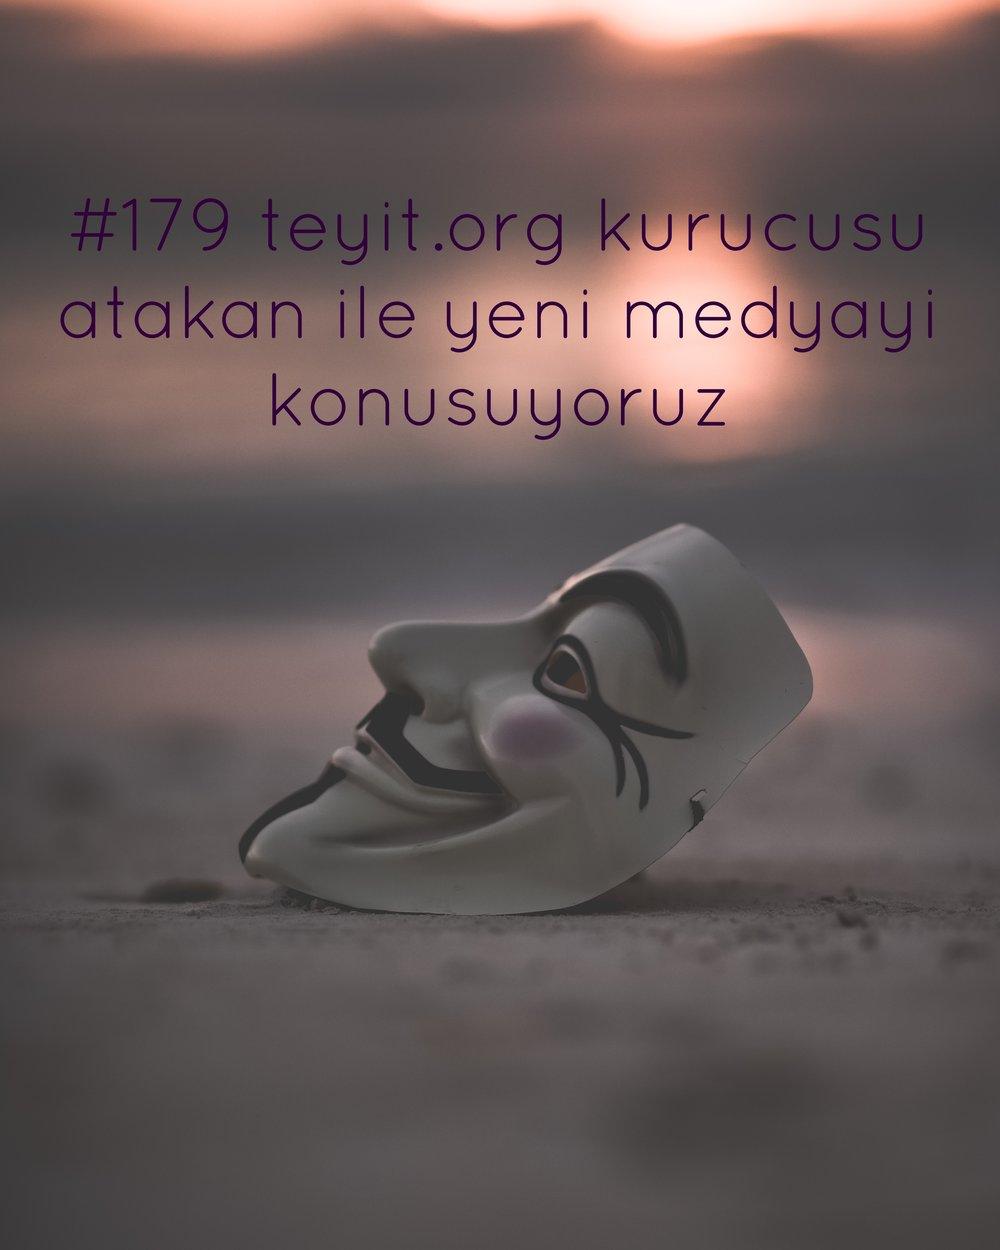 teyit.org